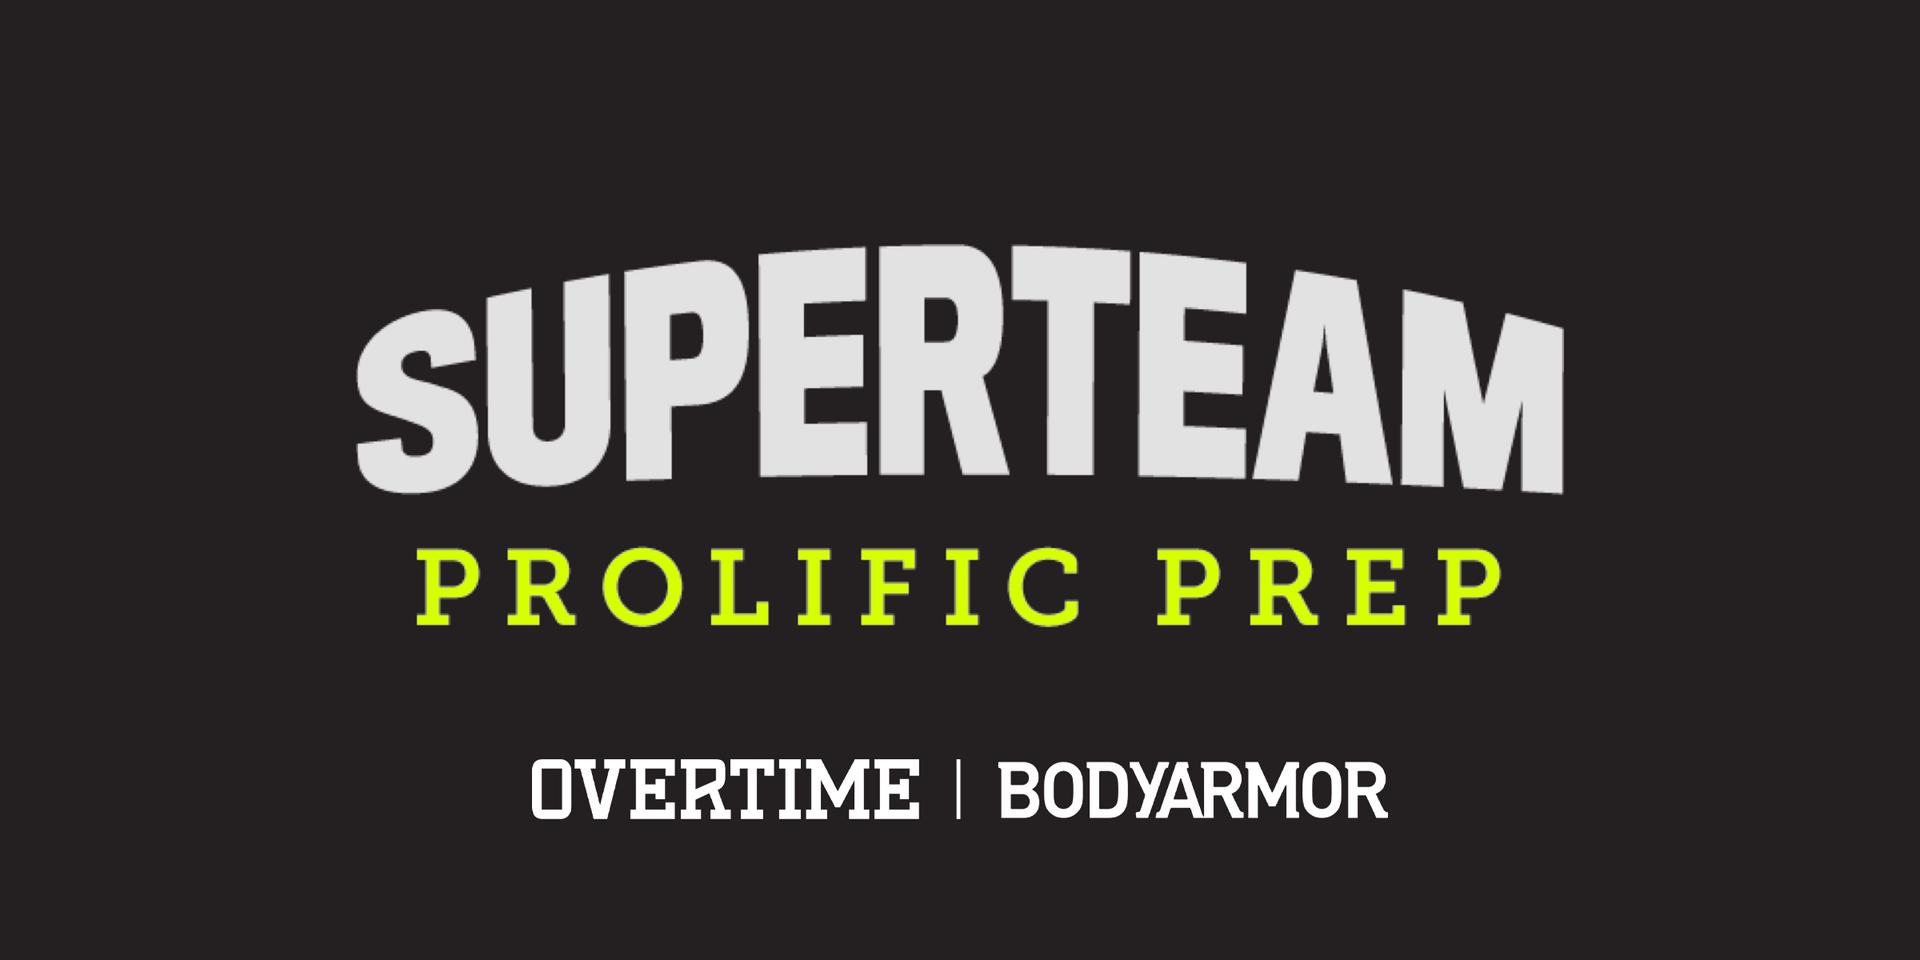 Superteam: Prolific Prep